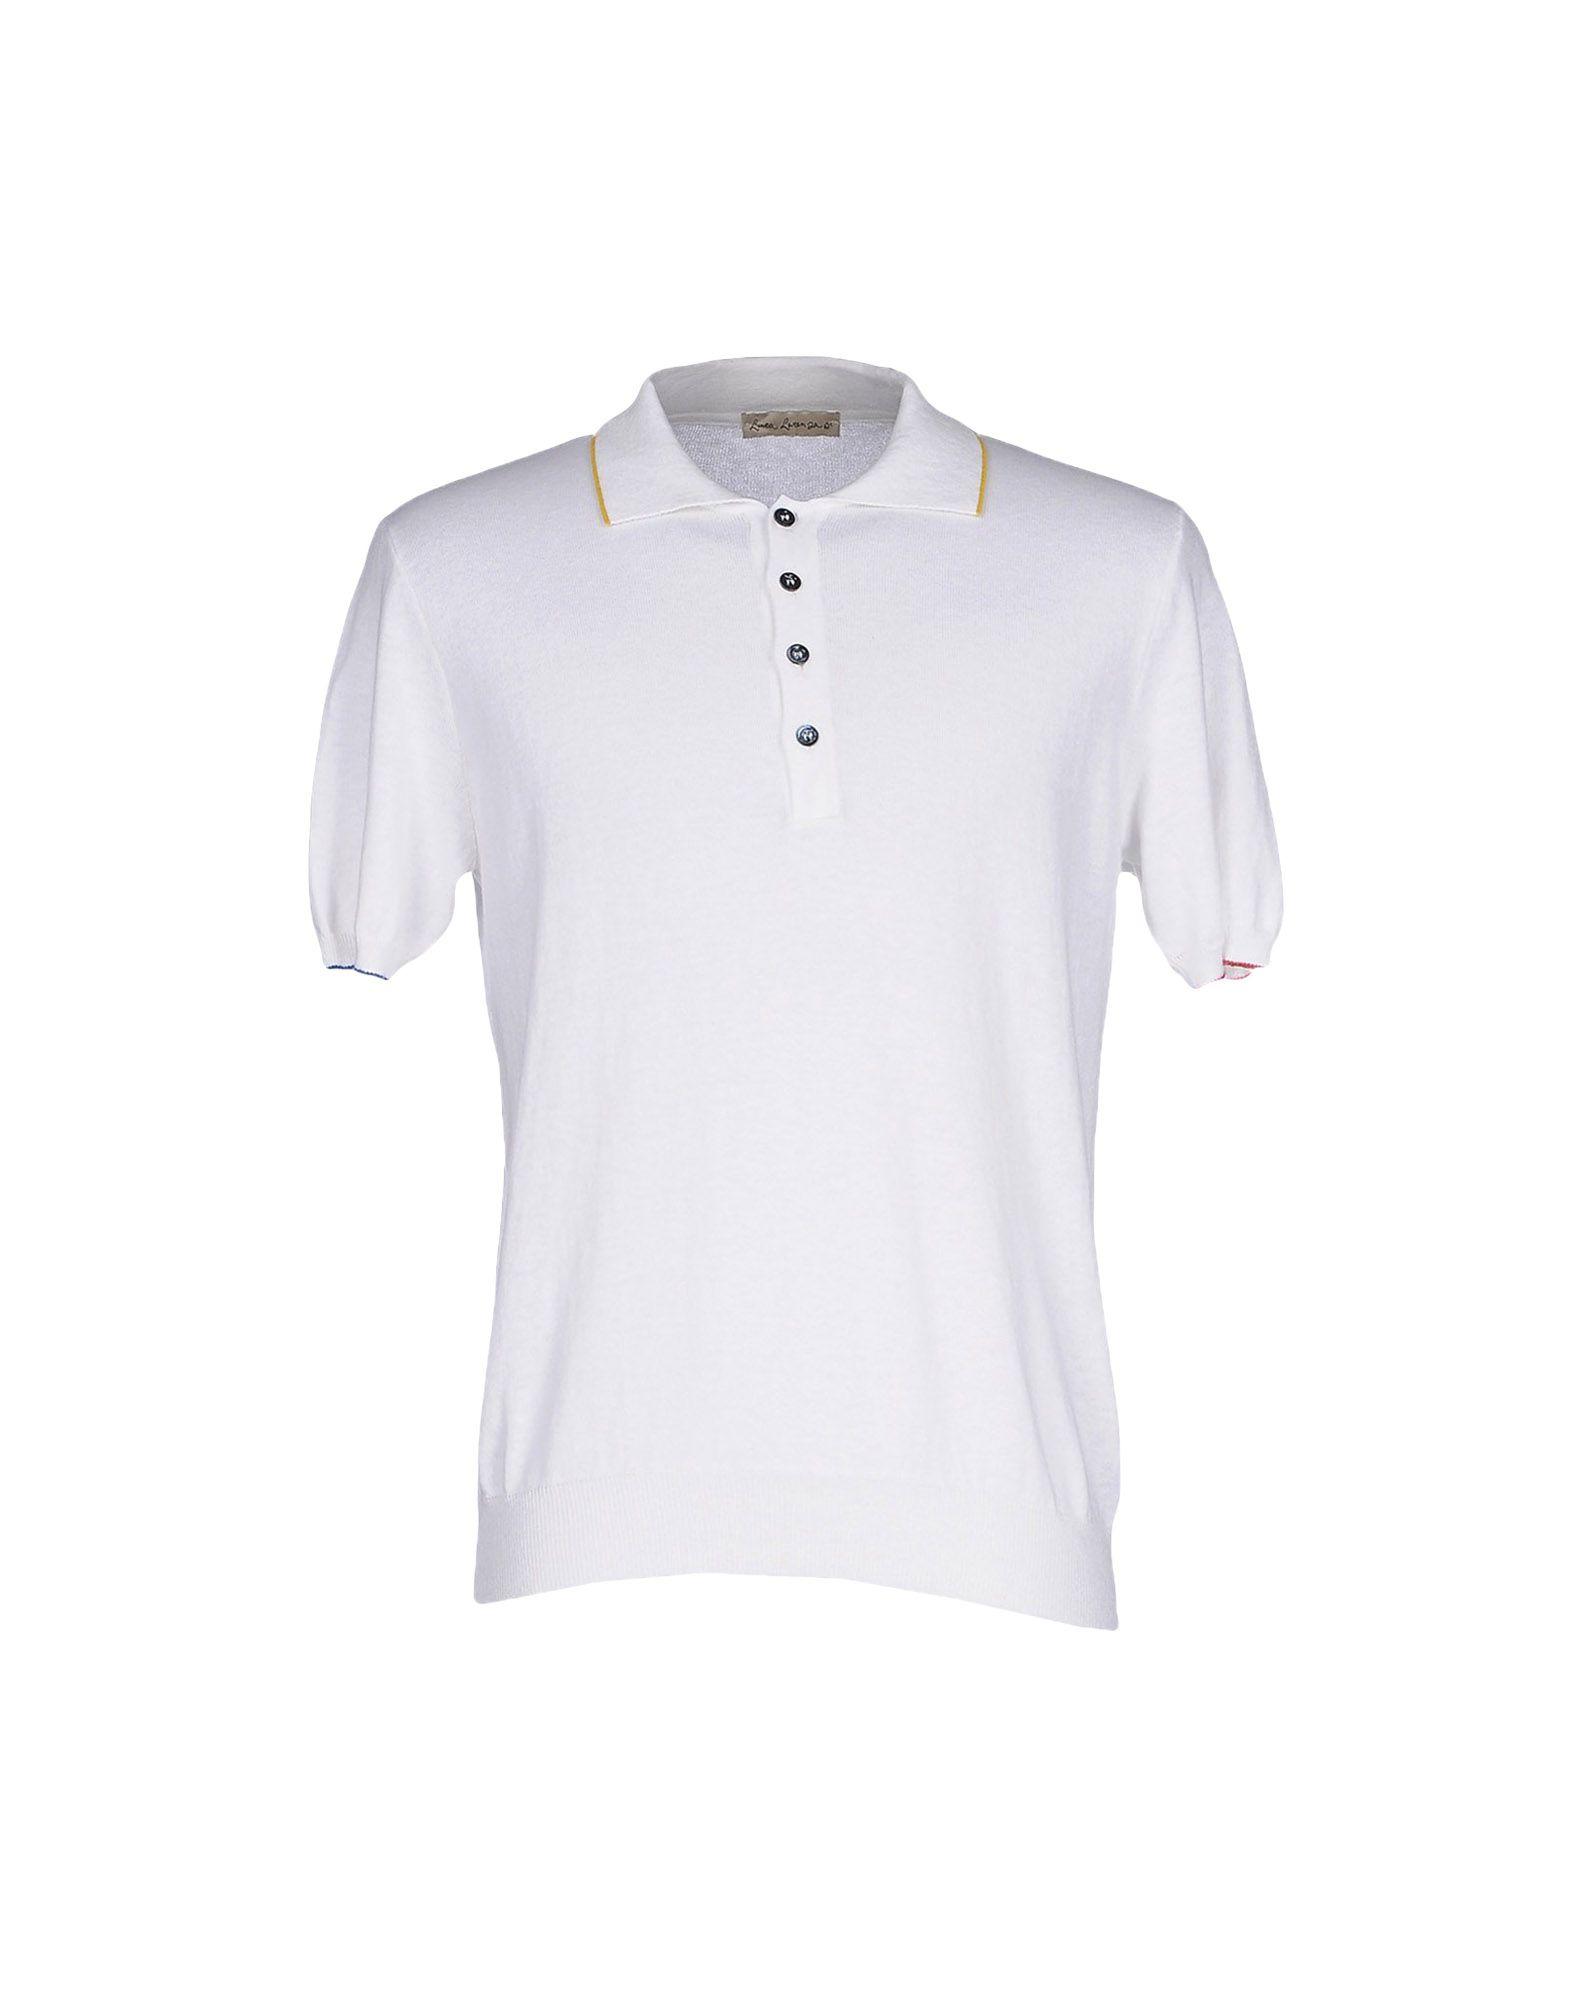 LUCA LARENZA Sweater in White